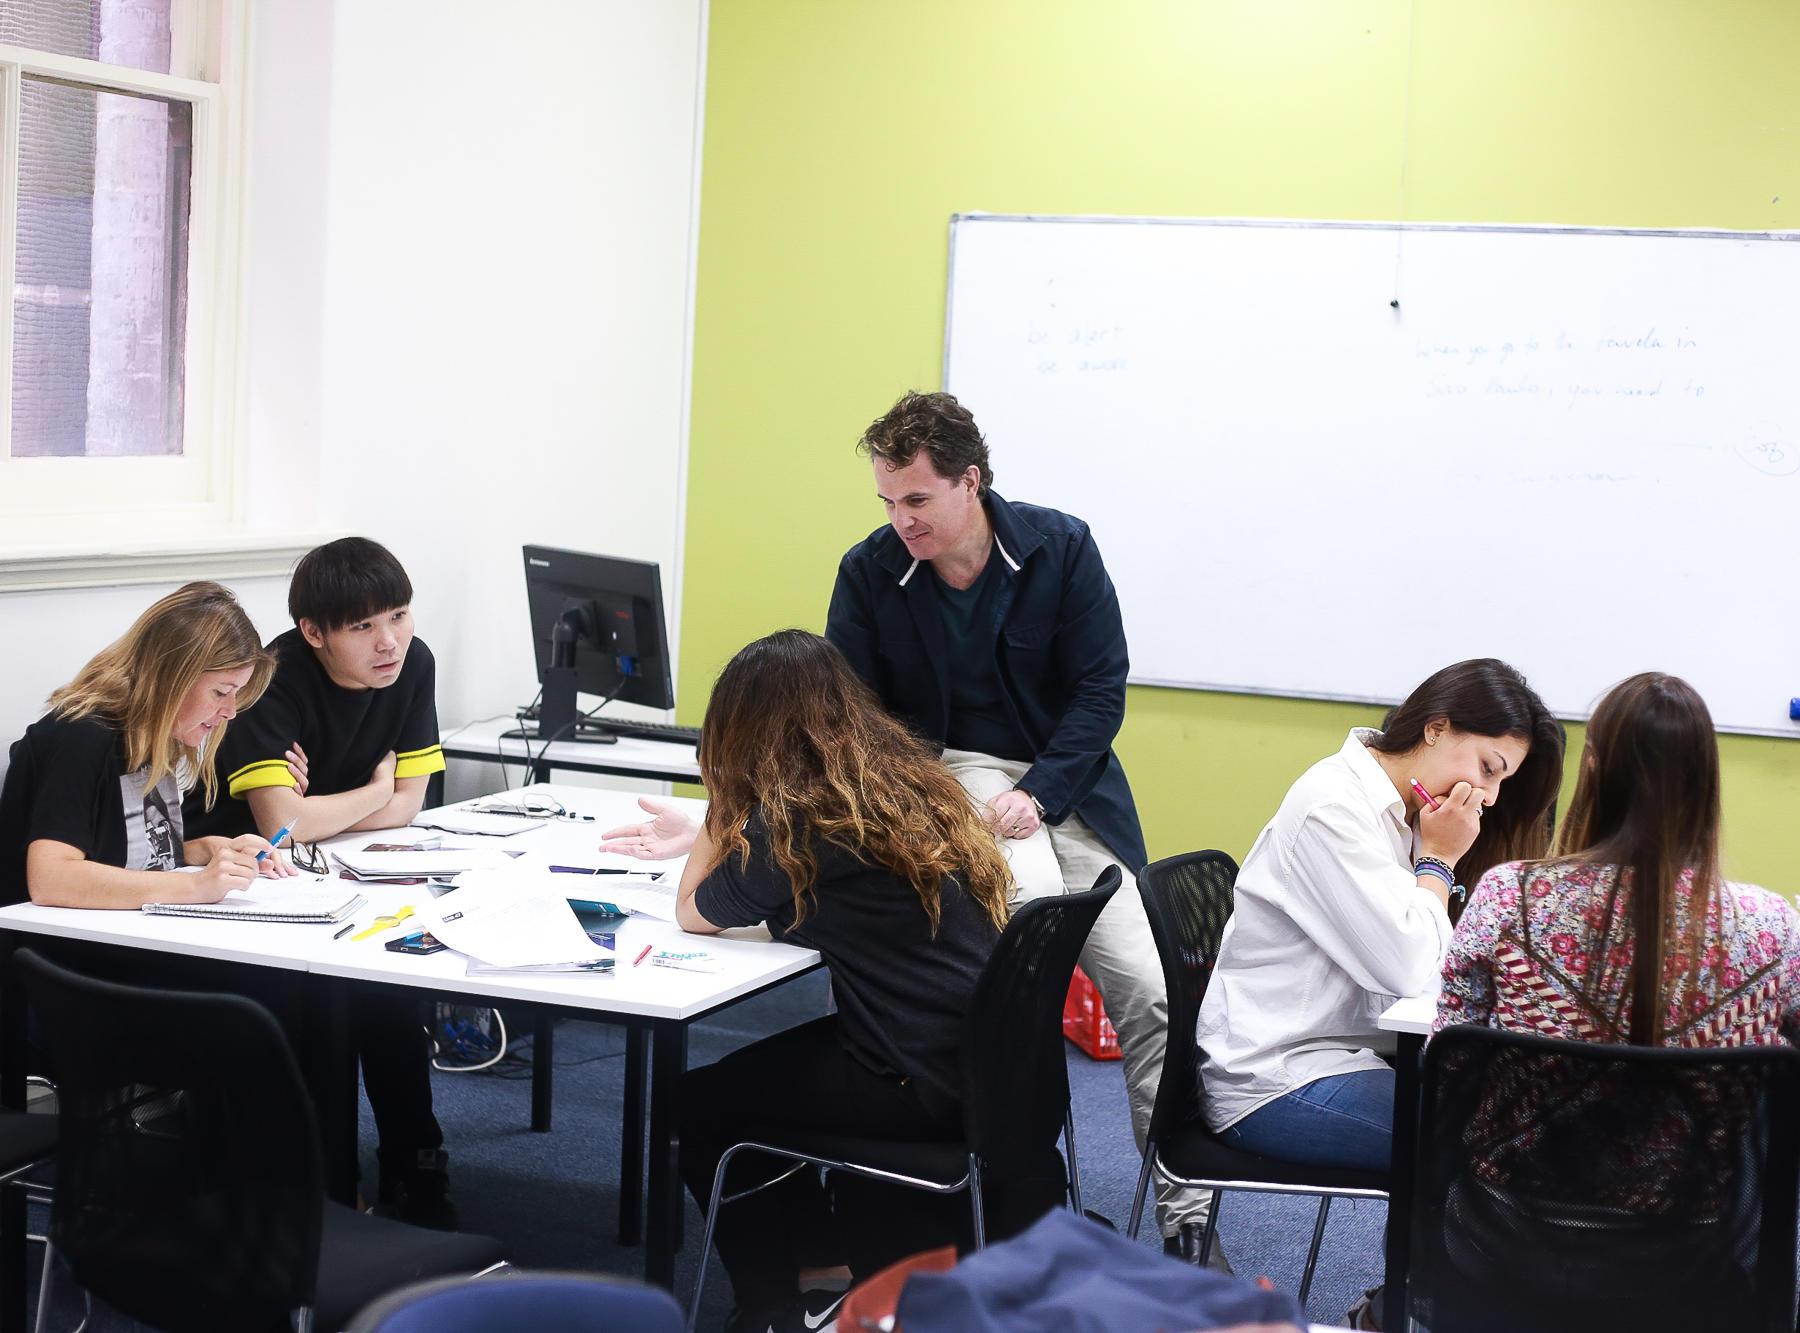 melbourne_school_classroom_students_05